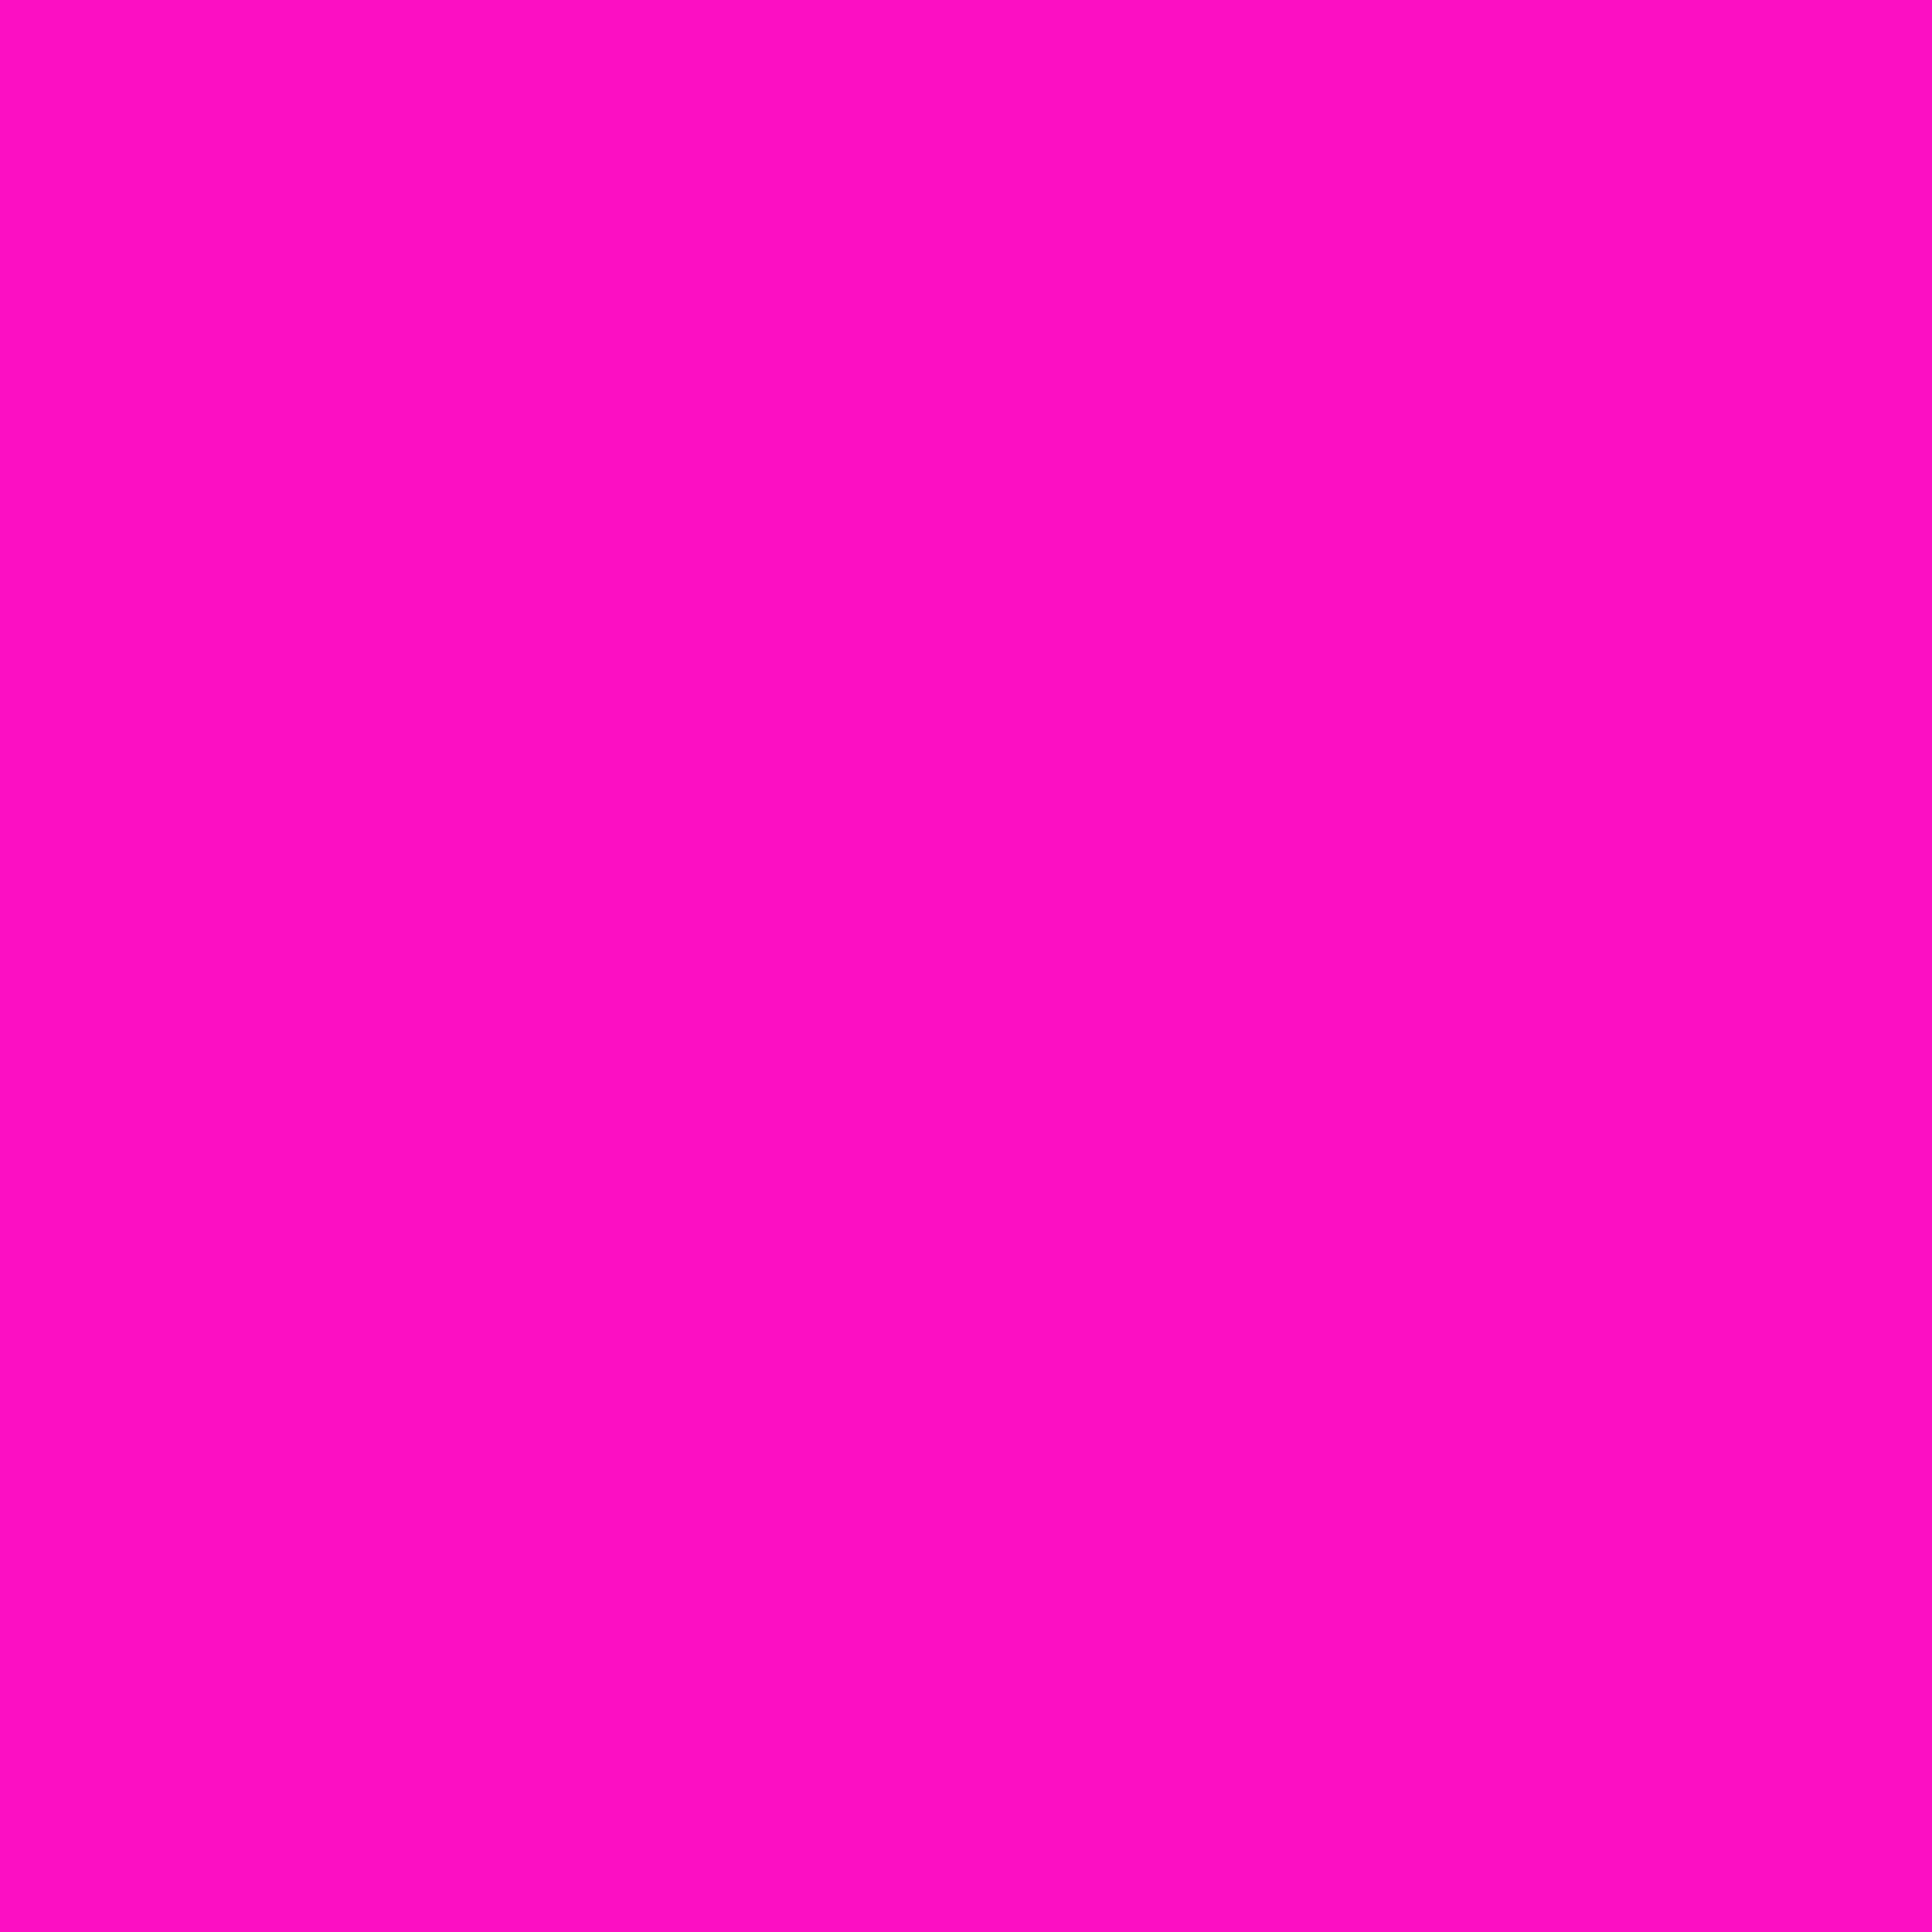 2048x2048 Shocking Pink Solid Color Background